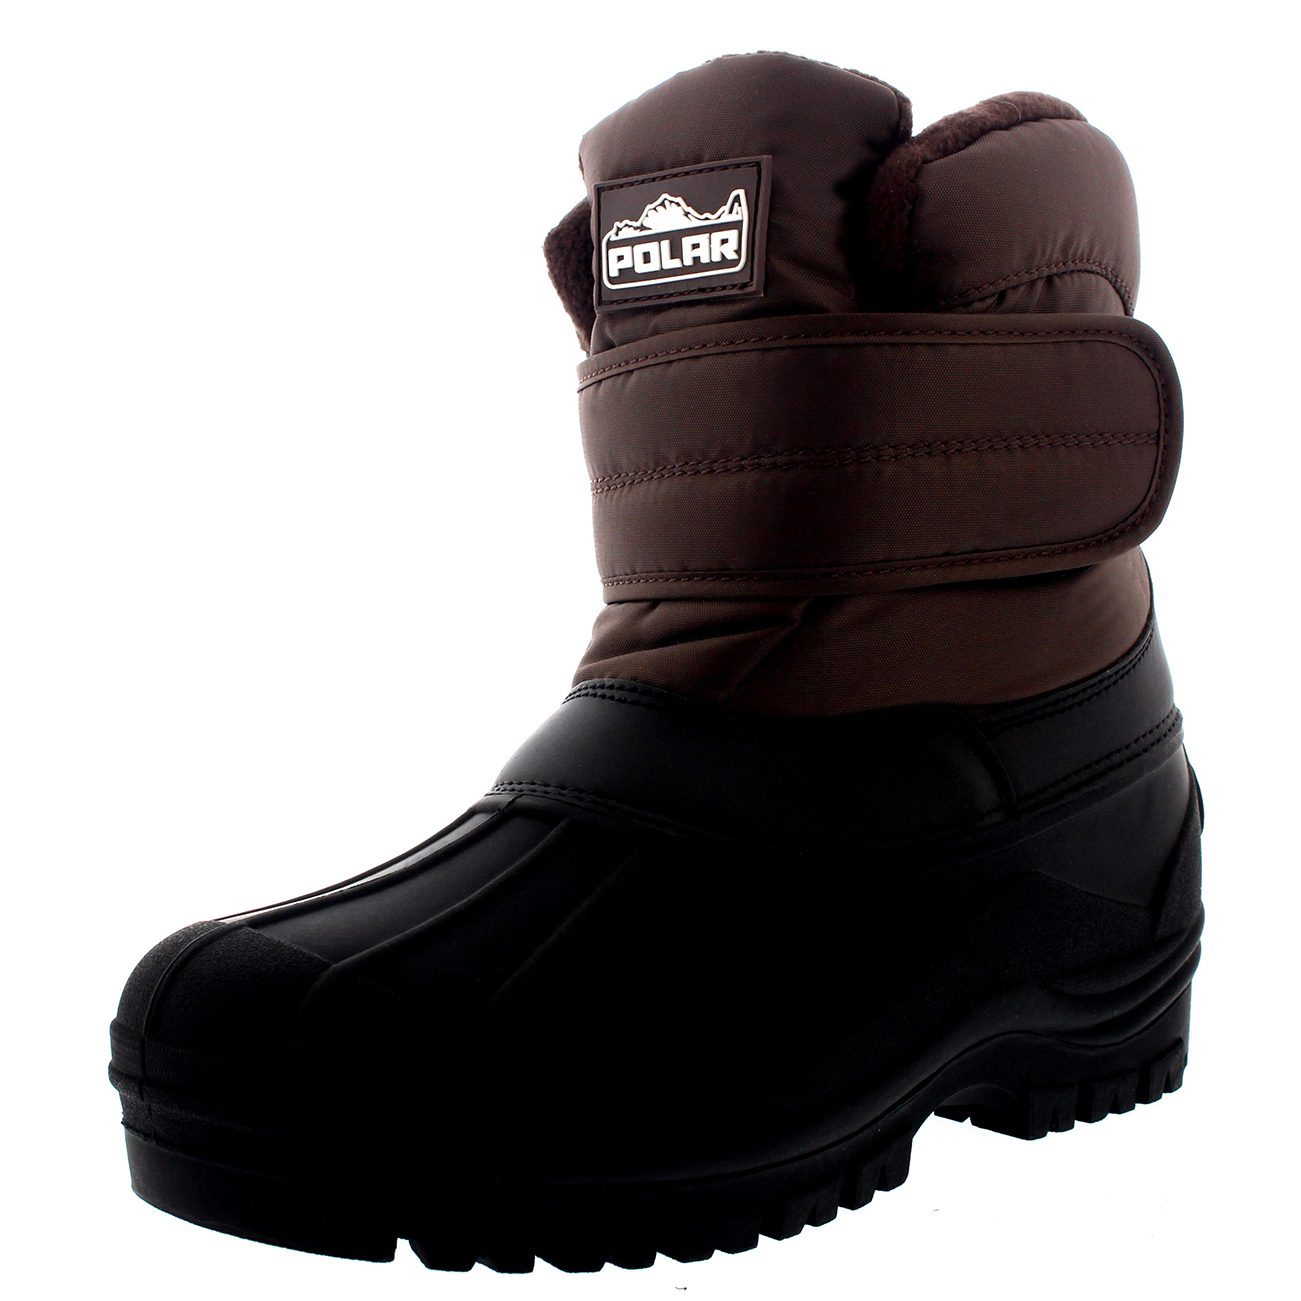 Womens Nylon Single Strap Waterproof Stable Hiking Thermal Mid Calf Boot UK 3-10